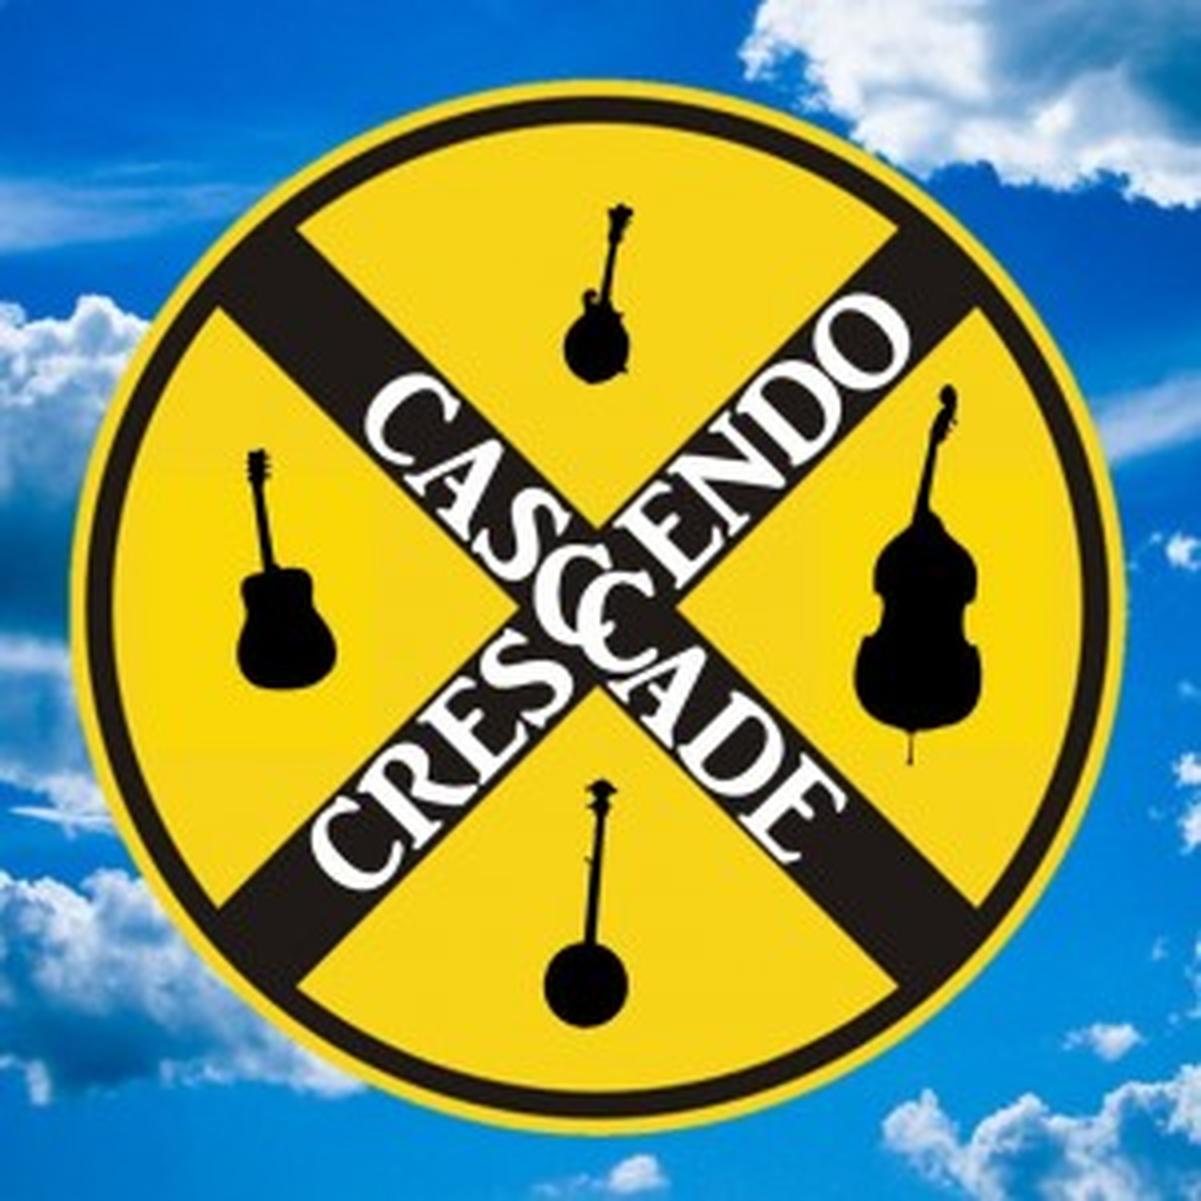 Cascade Crescendo wiki, Cascade Crescendo review, Cascade Crescendo history, Cascade Crescendo news